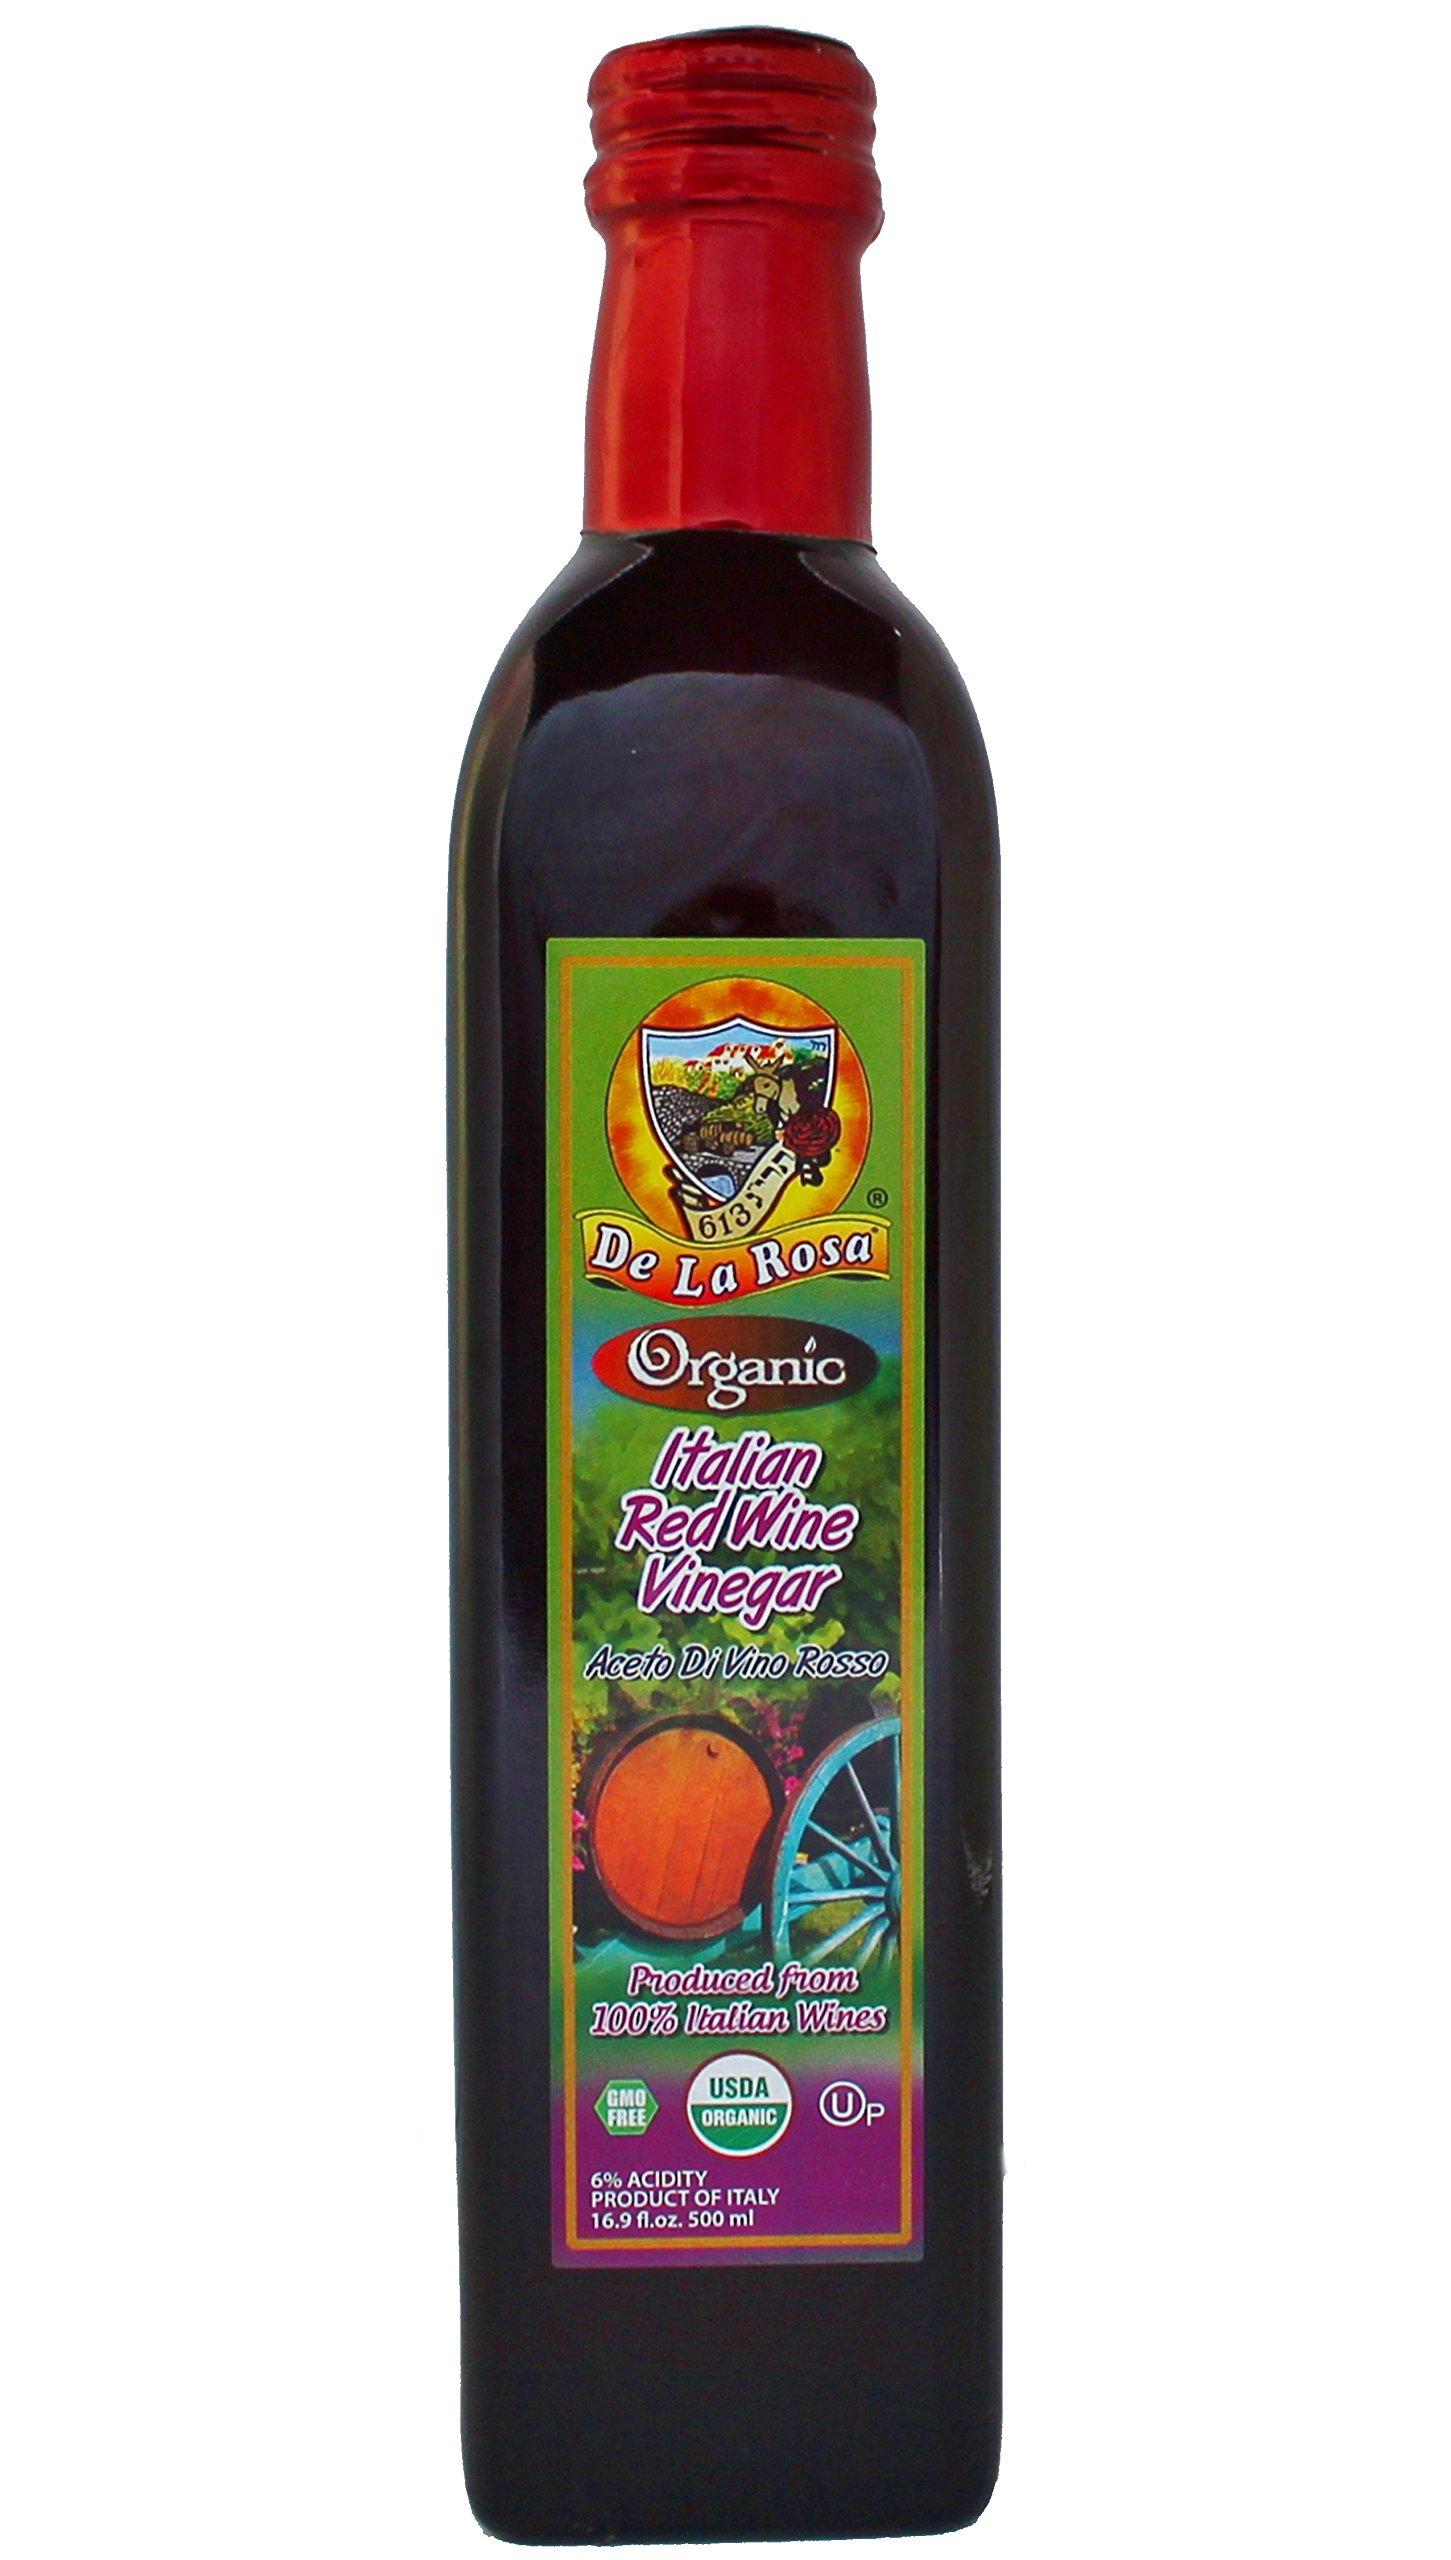 De La Rosa Real Foods & Vineyards - Organic Italian Red Wine Vinegar (16.9 oz/500 ml)